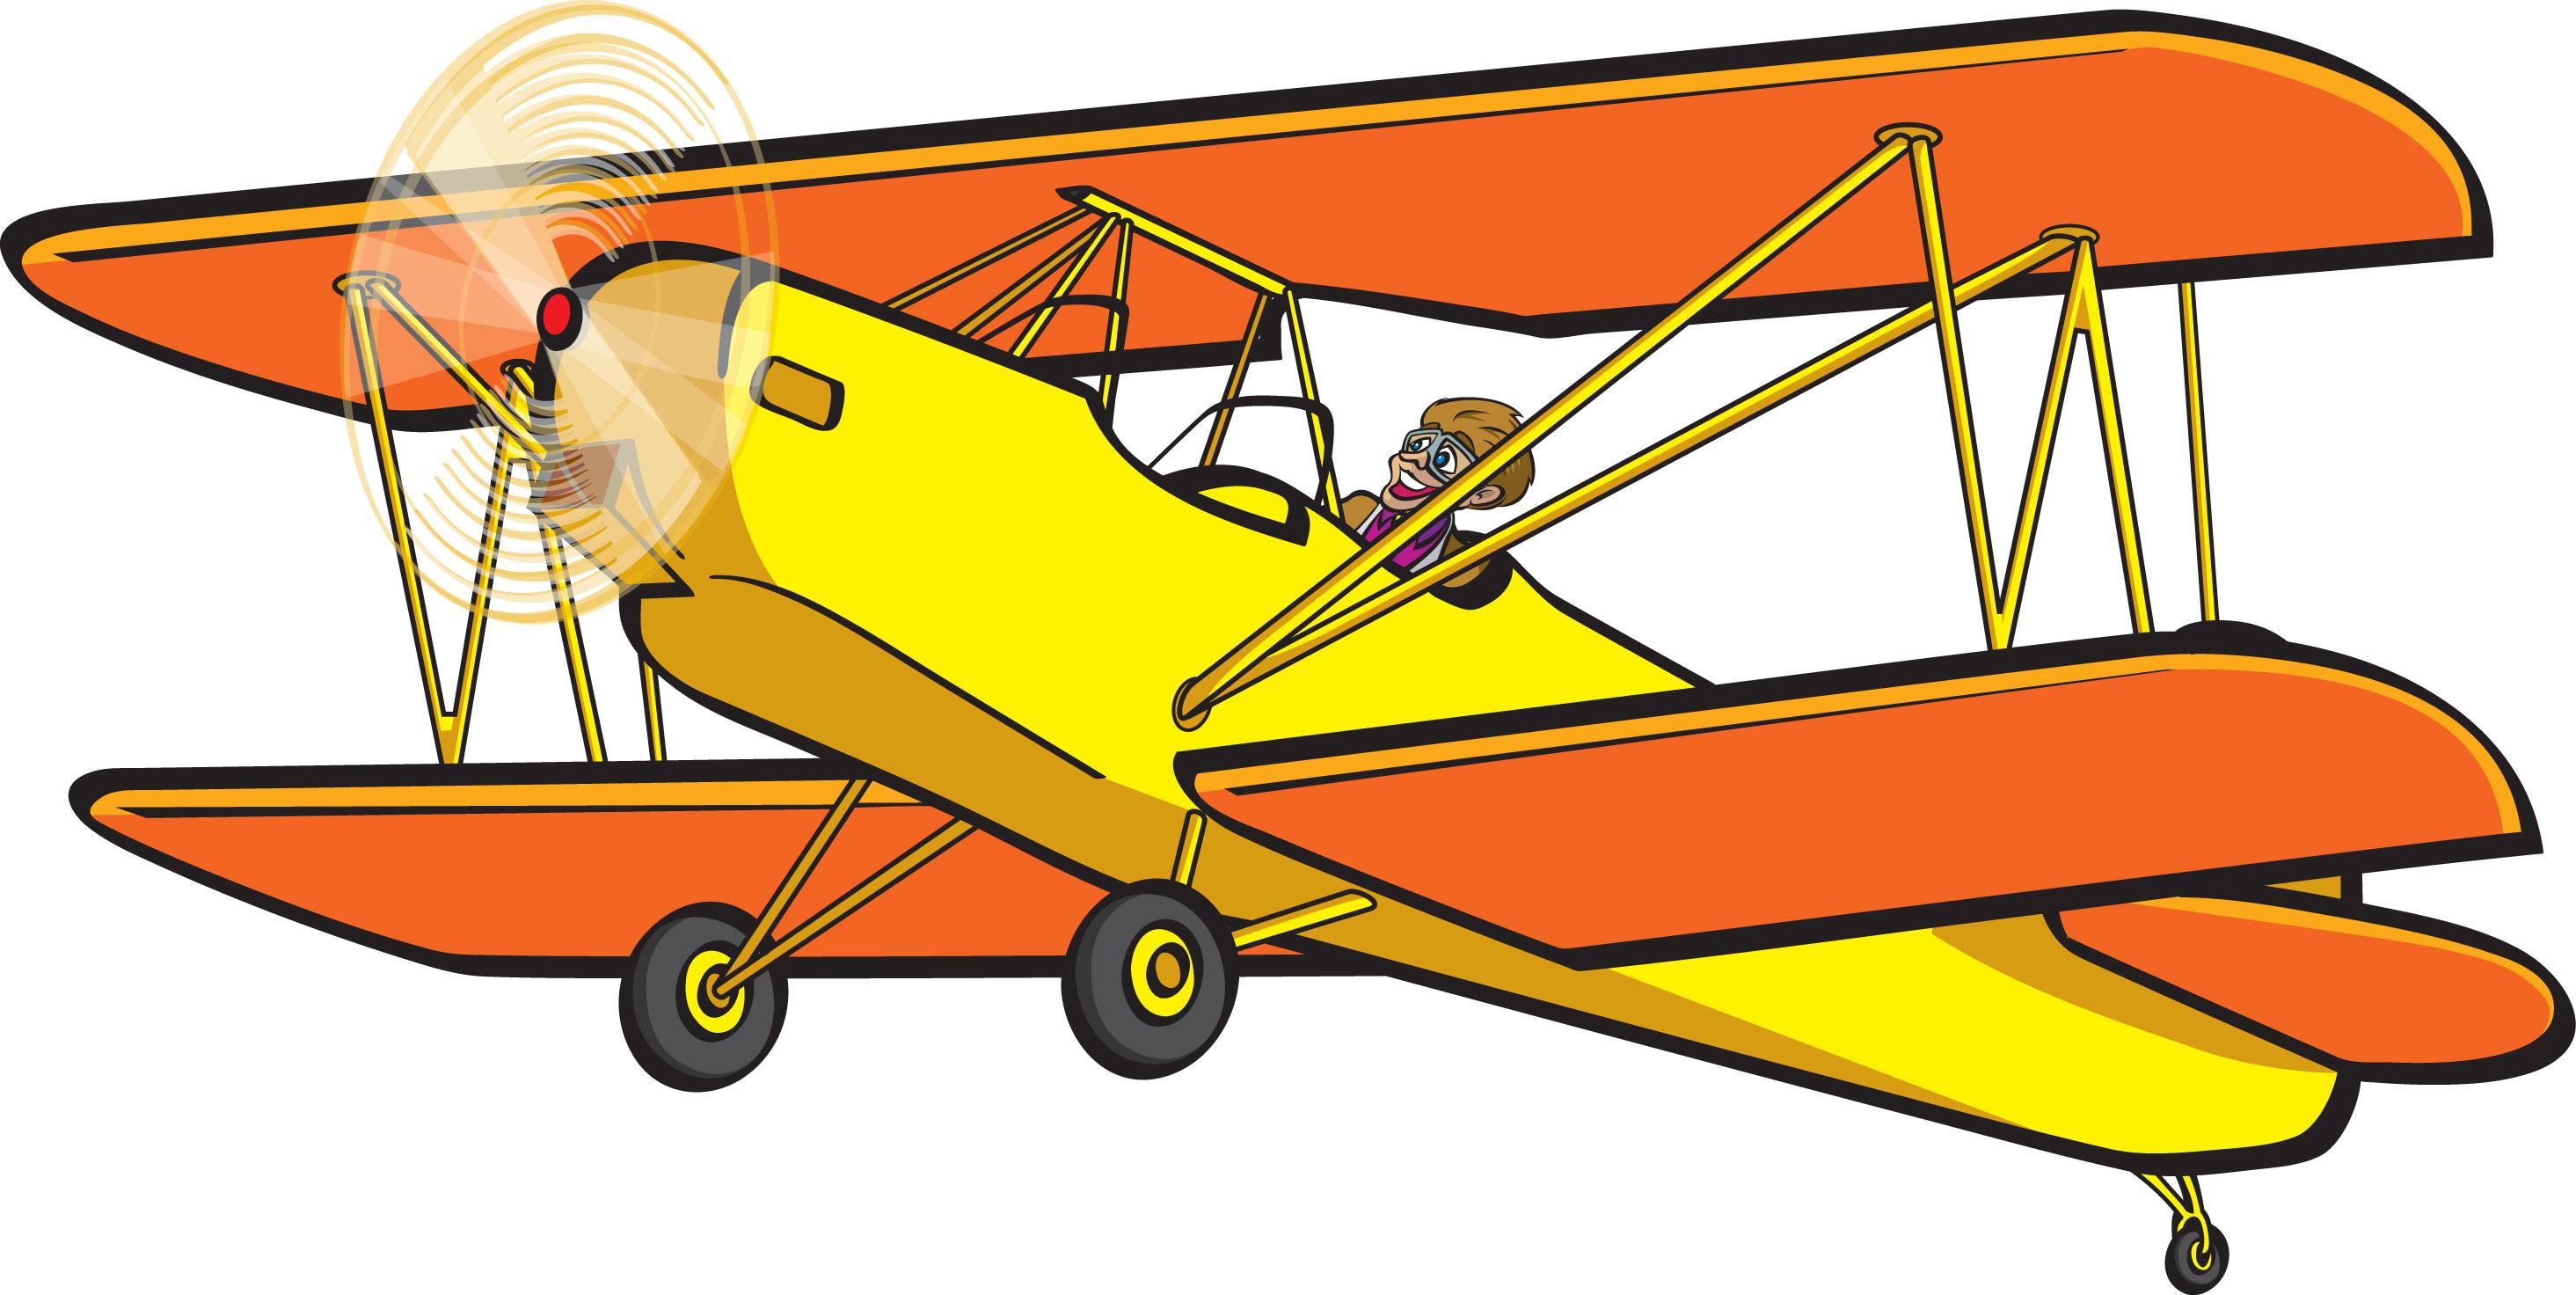 Image Of Biplane Clipart Biplane Clip Ar-Image of Biplane Clipart Biplane Clip Art-14